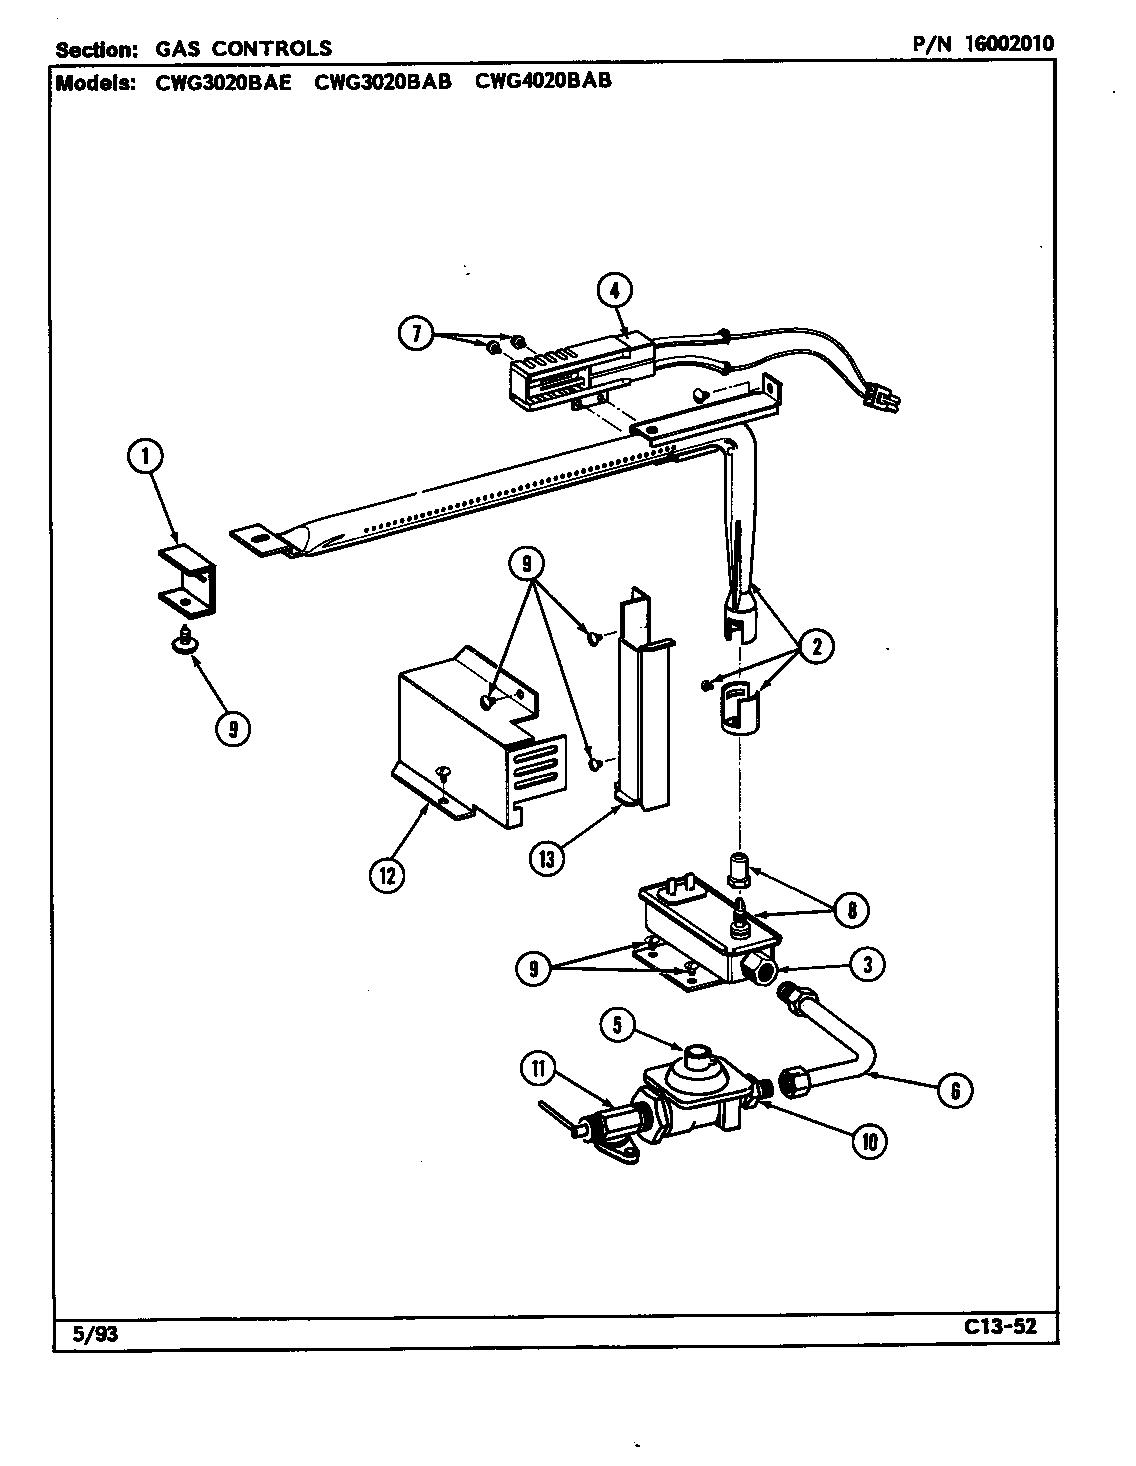 GAS CONTROLS Diagram & Parts List for Model cwg3020bab